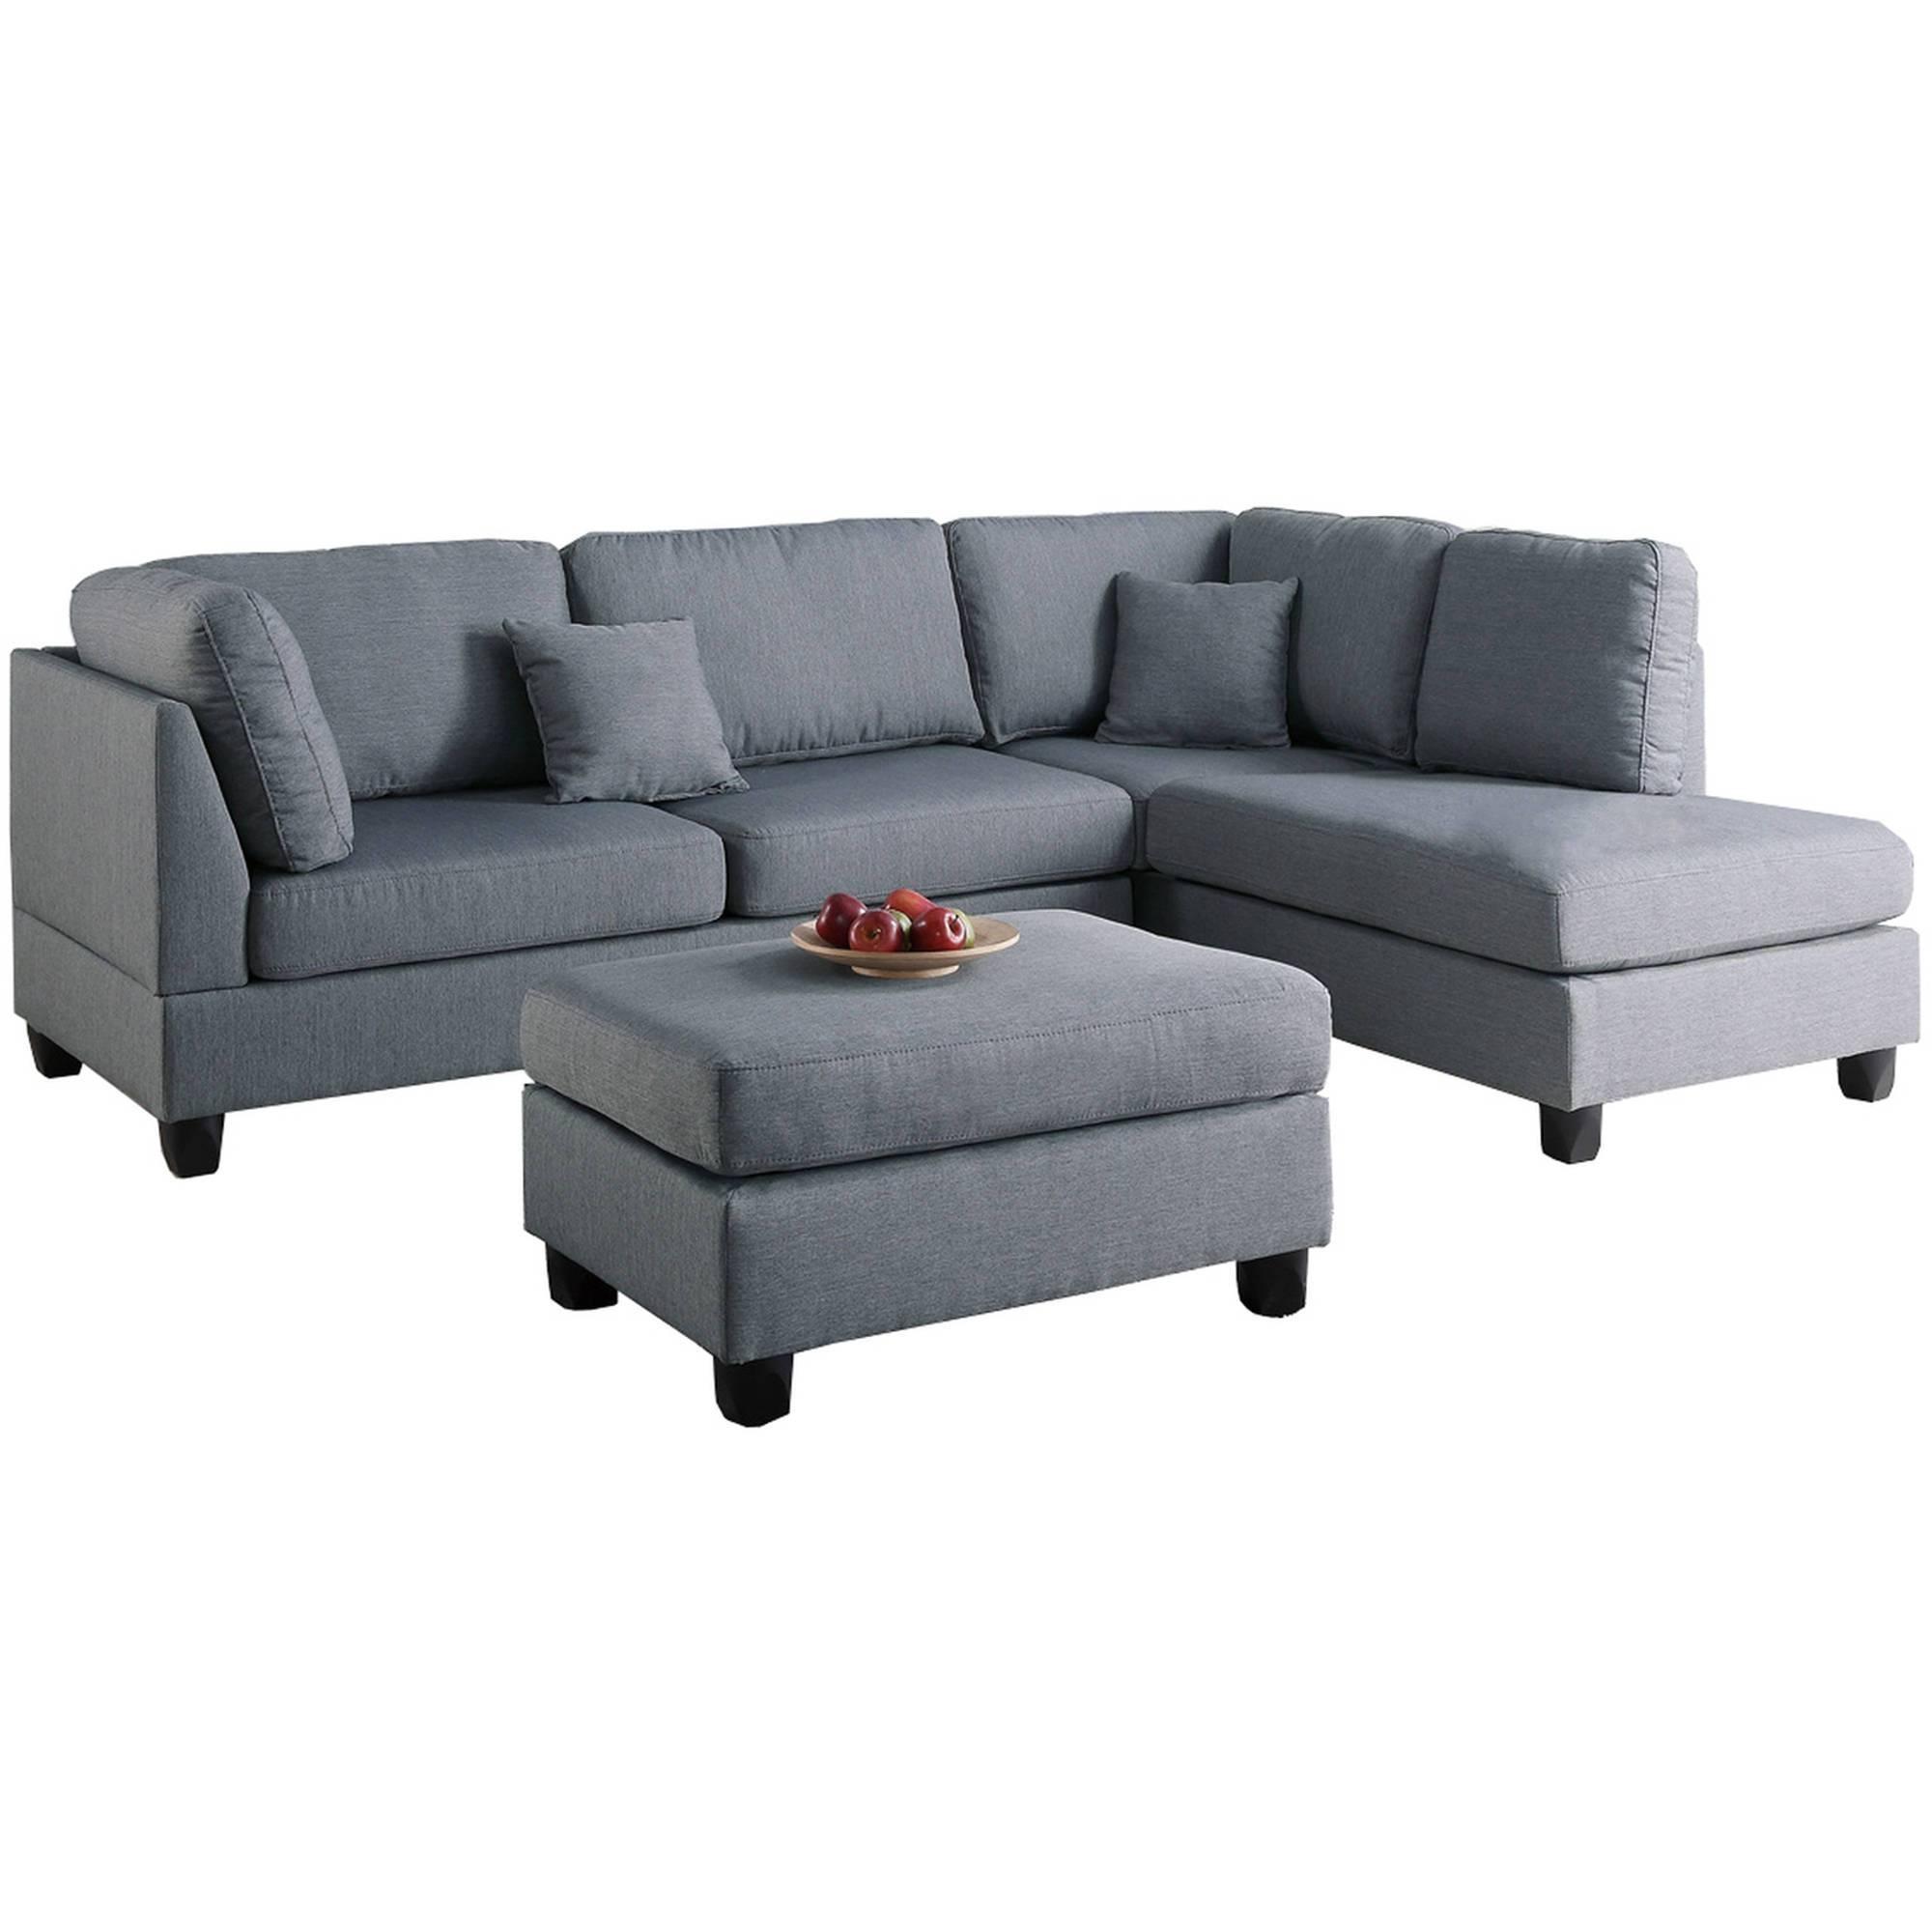 Living Room Furniture regarding Living Room Sofas (Image 16 of 30)